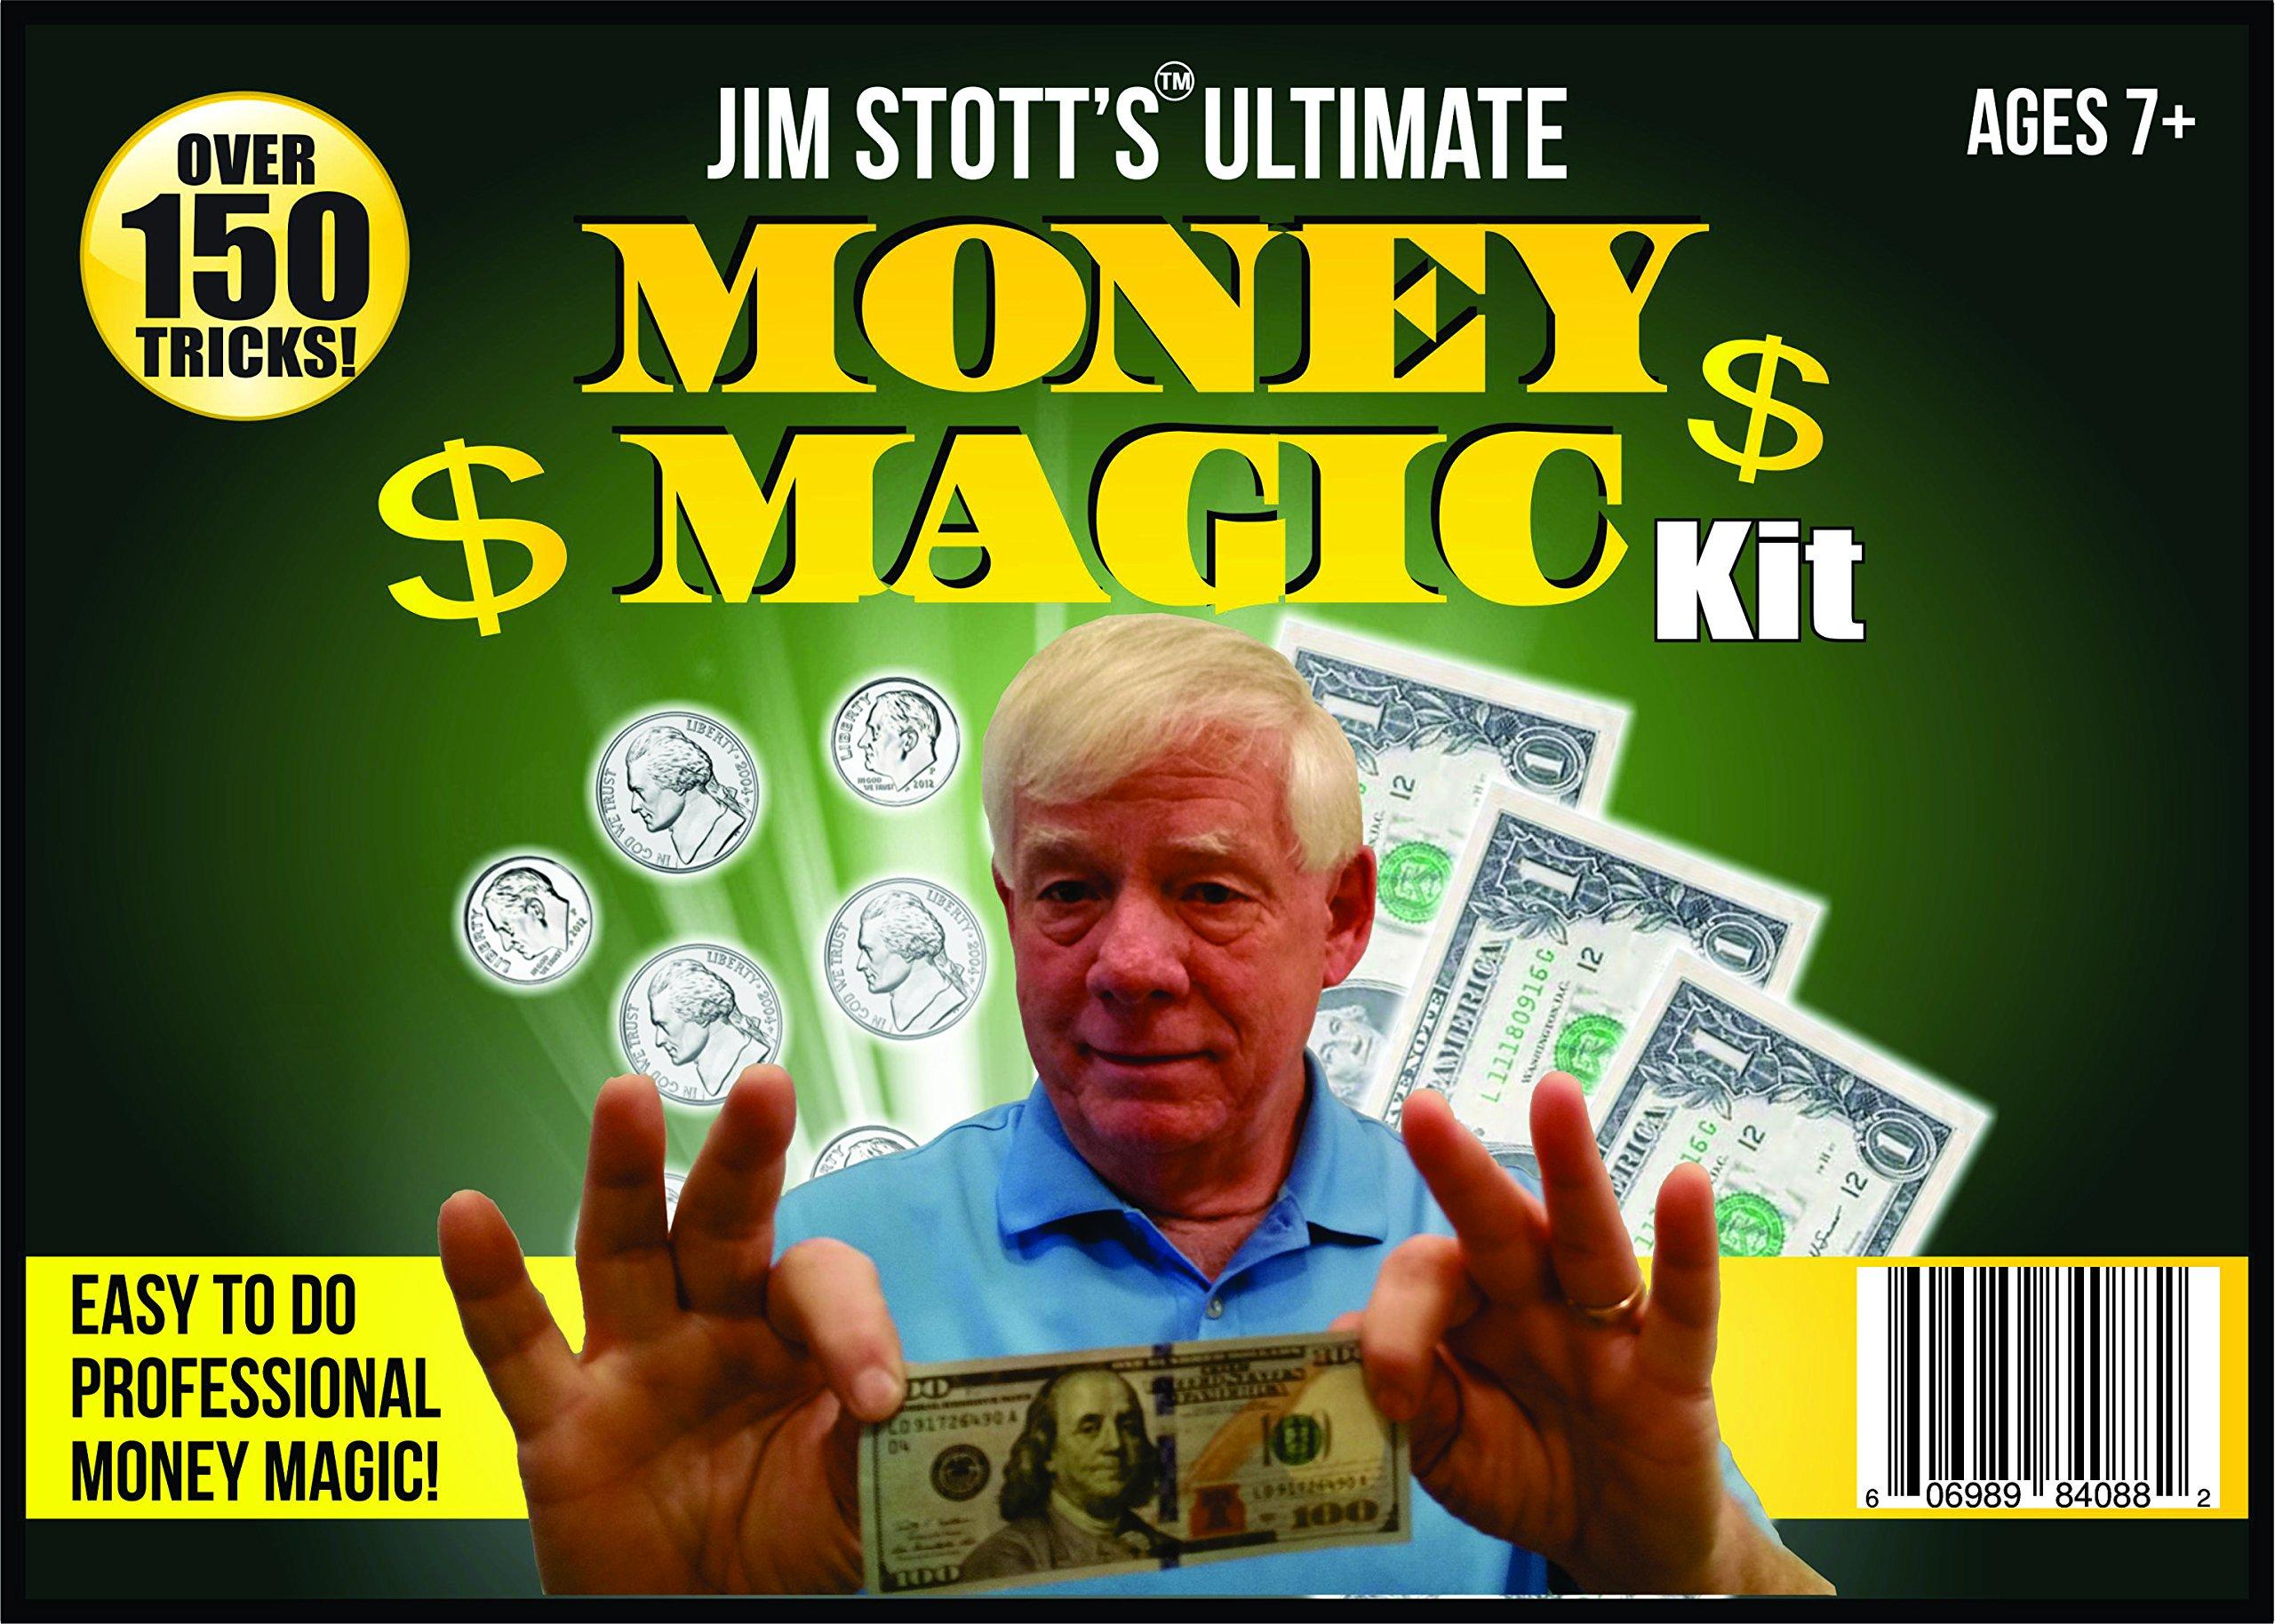 Jim Stott's 'Ultimate Money Magic Kit, Magic Tricks Set for Adults, Coin Thru Glass, Flying Coins, Magic Pen Penetration, The Money Maker, Folding Paper Mystery, The Ultimate Levitation System by Jim Stott Magic